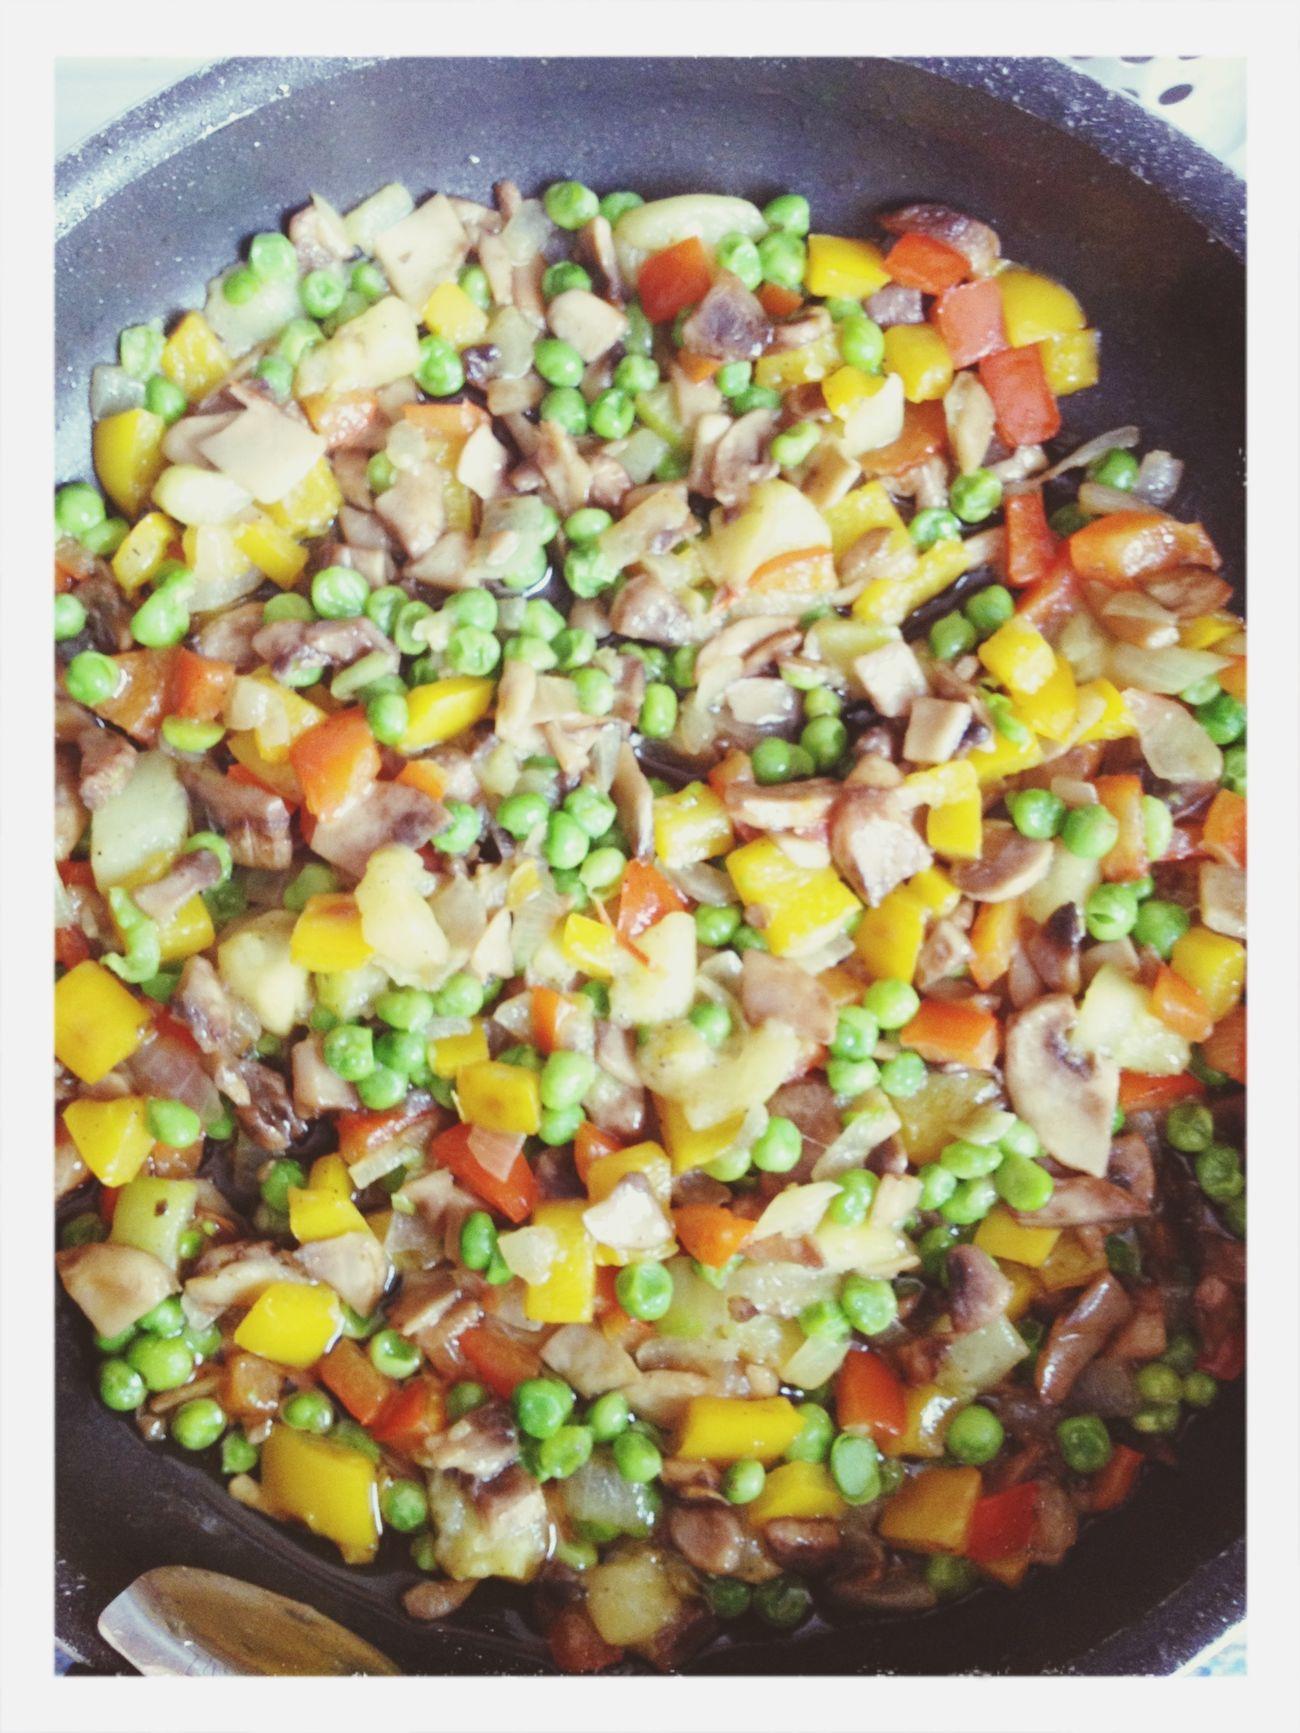 Sautéed vegetables (onion, zucchinni, red pepper, yellow pepper, mushrooms and peas). Food Vegetarian Food Vegan Sauteed Veggies